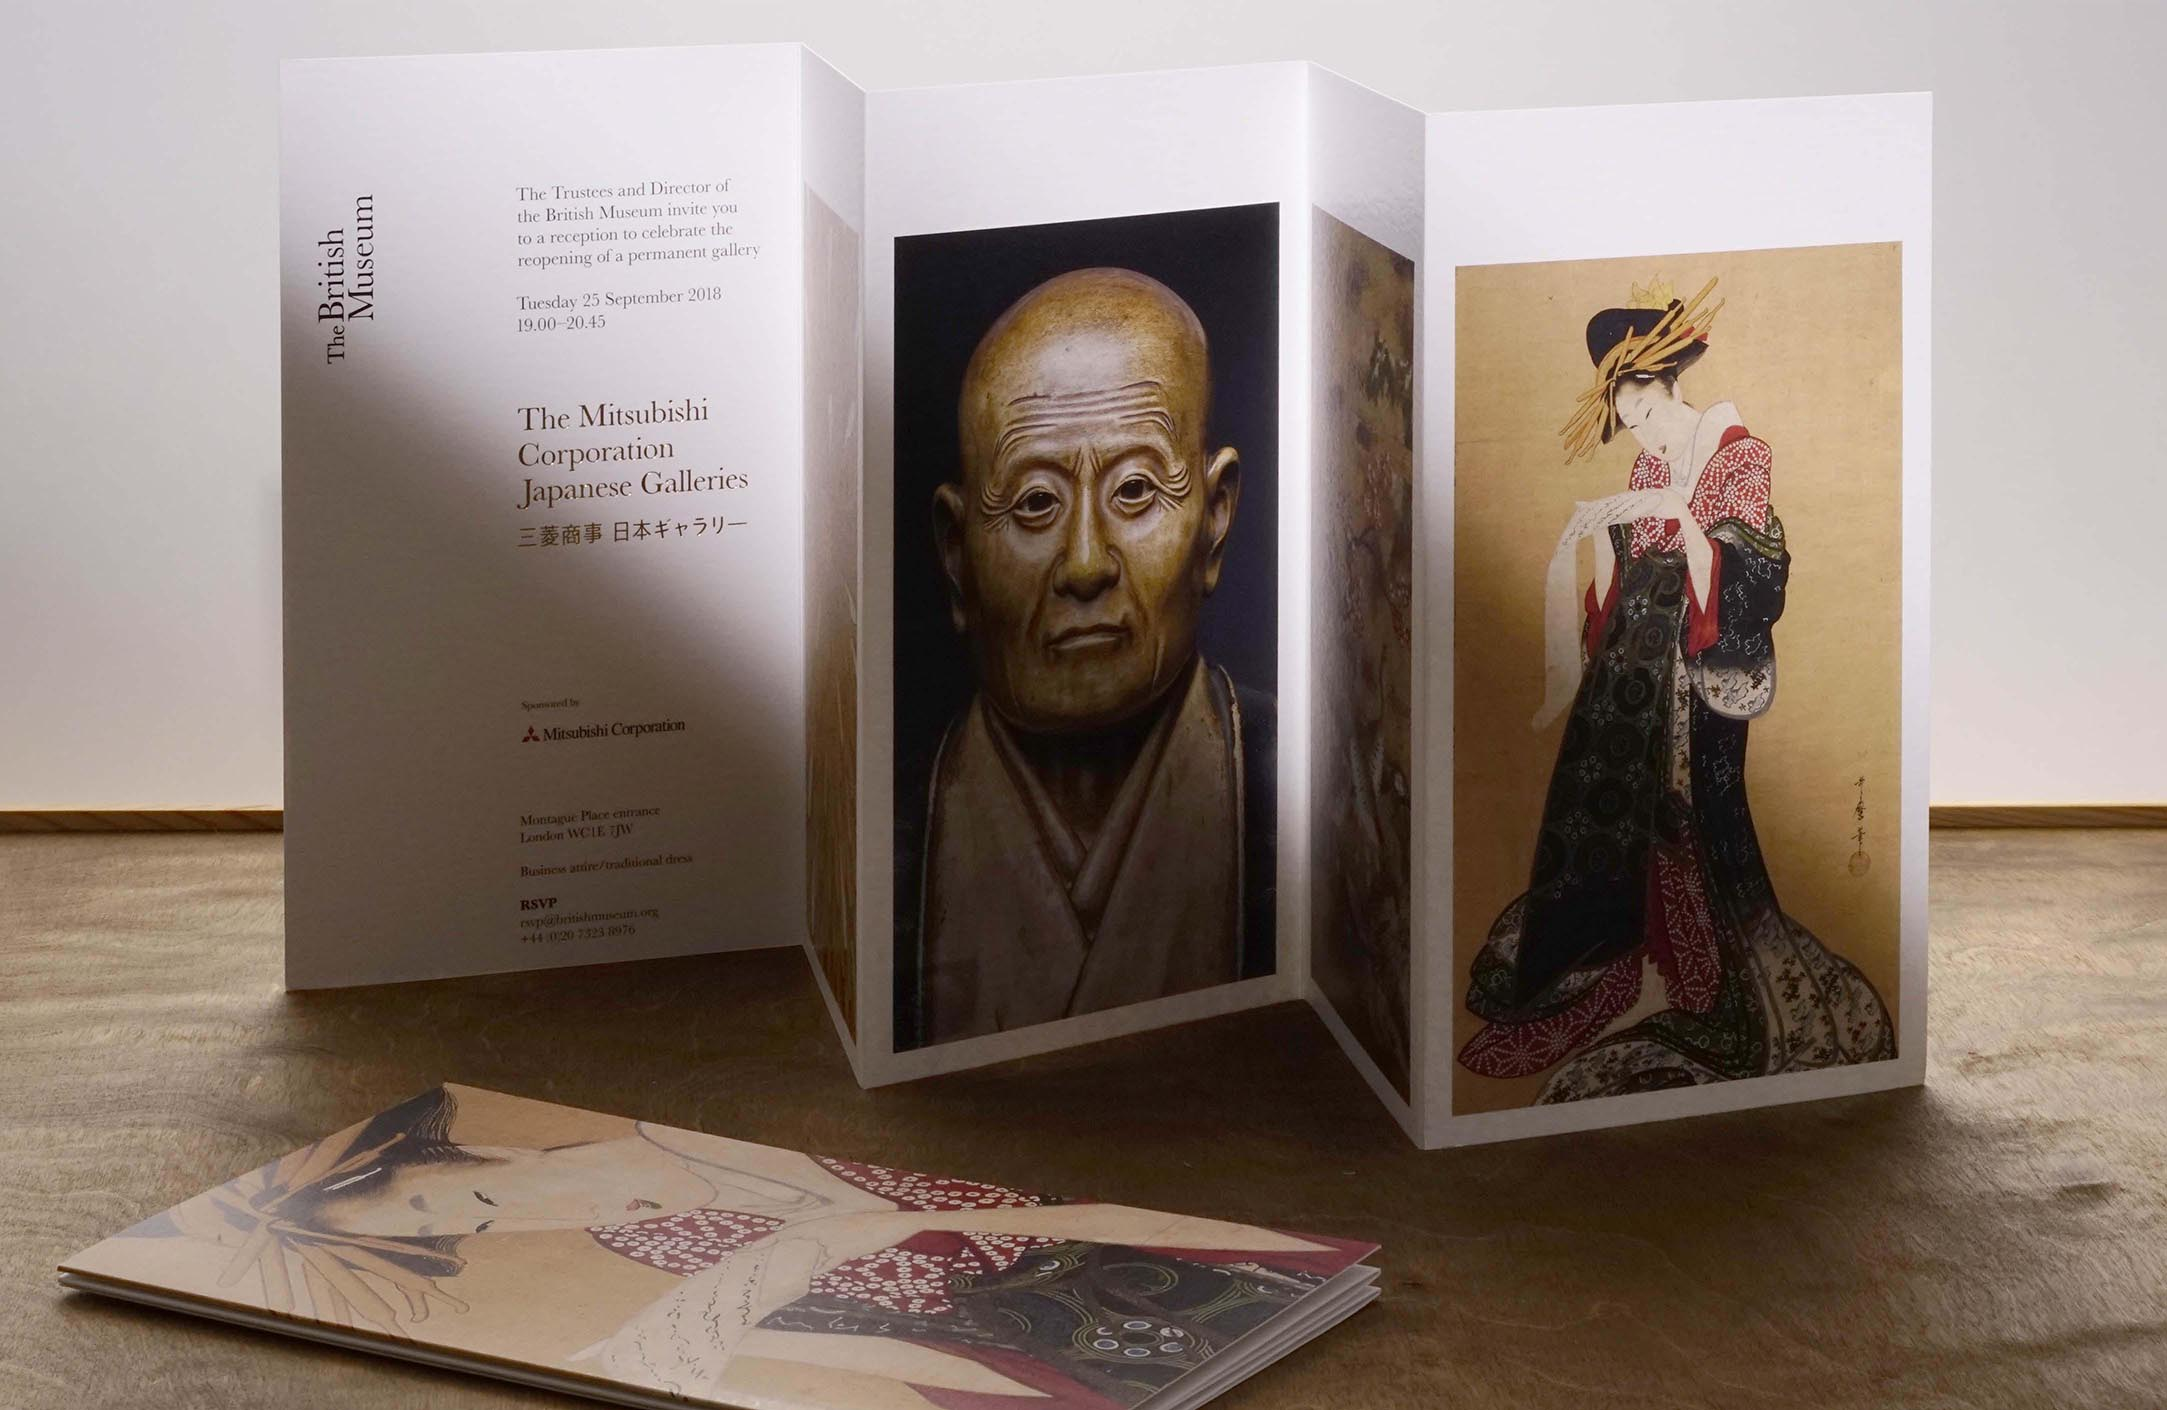 British Museum Japanese Galleries